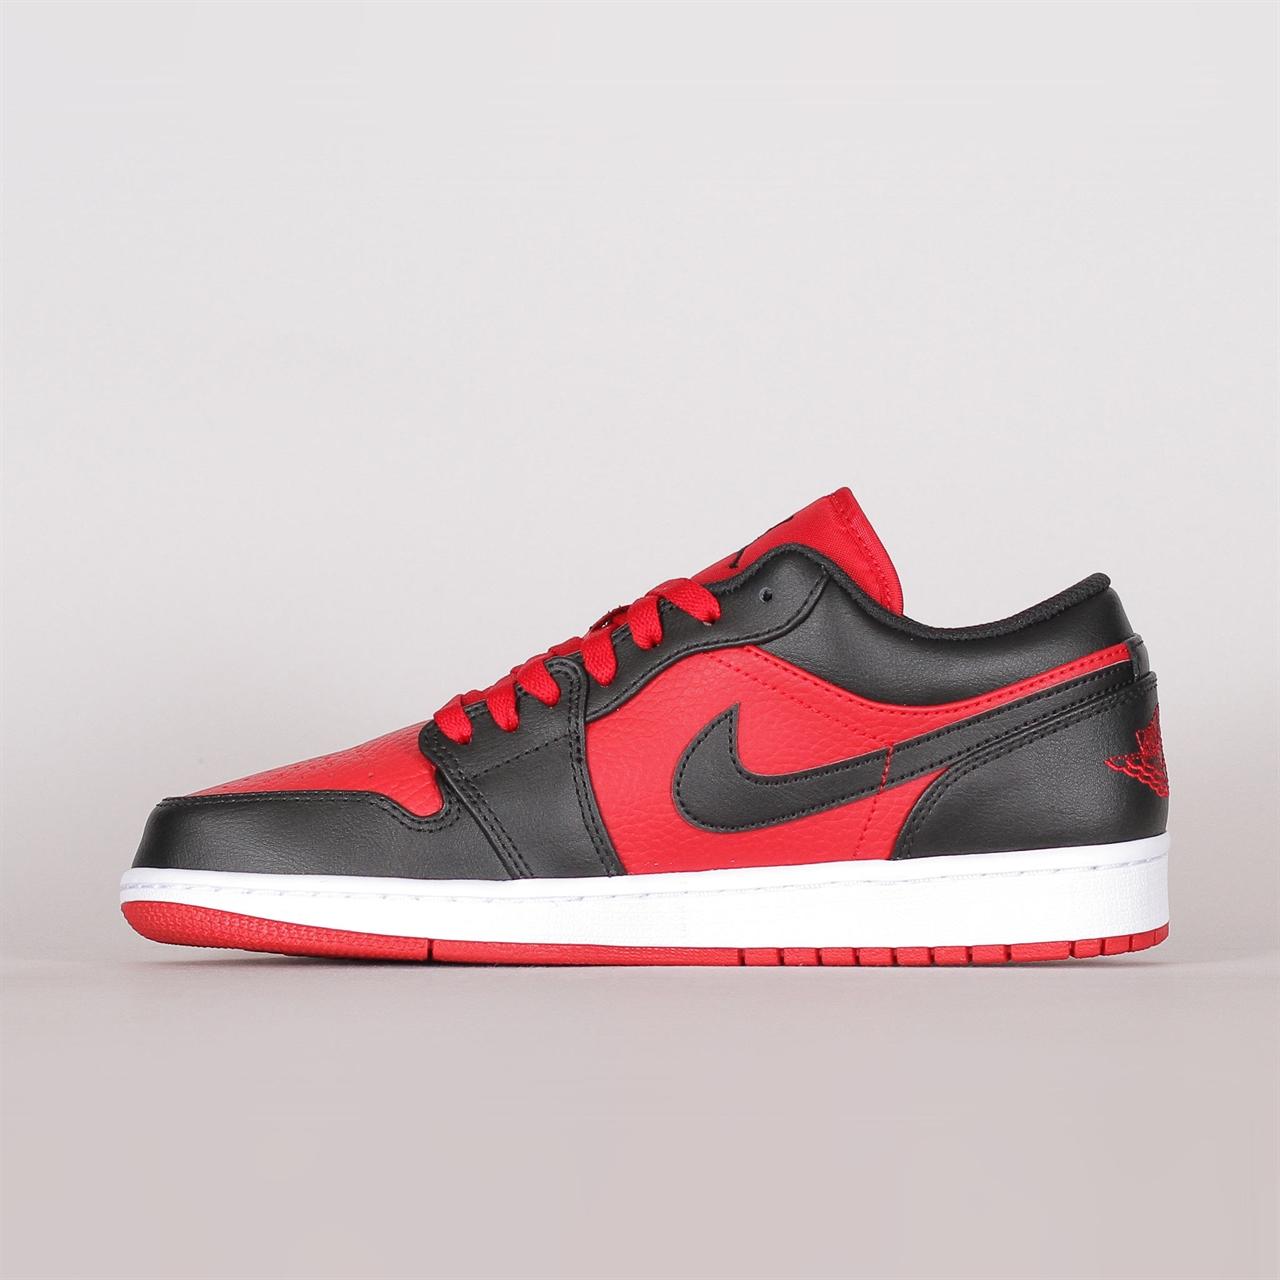 san francisco 37dee b5ee3 Shelta - Nike Air Jordan 1 Low (553558-610)